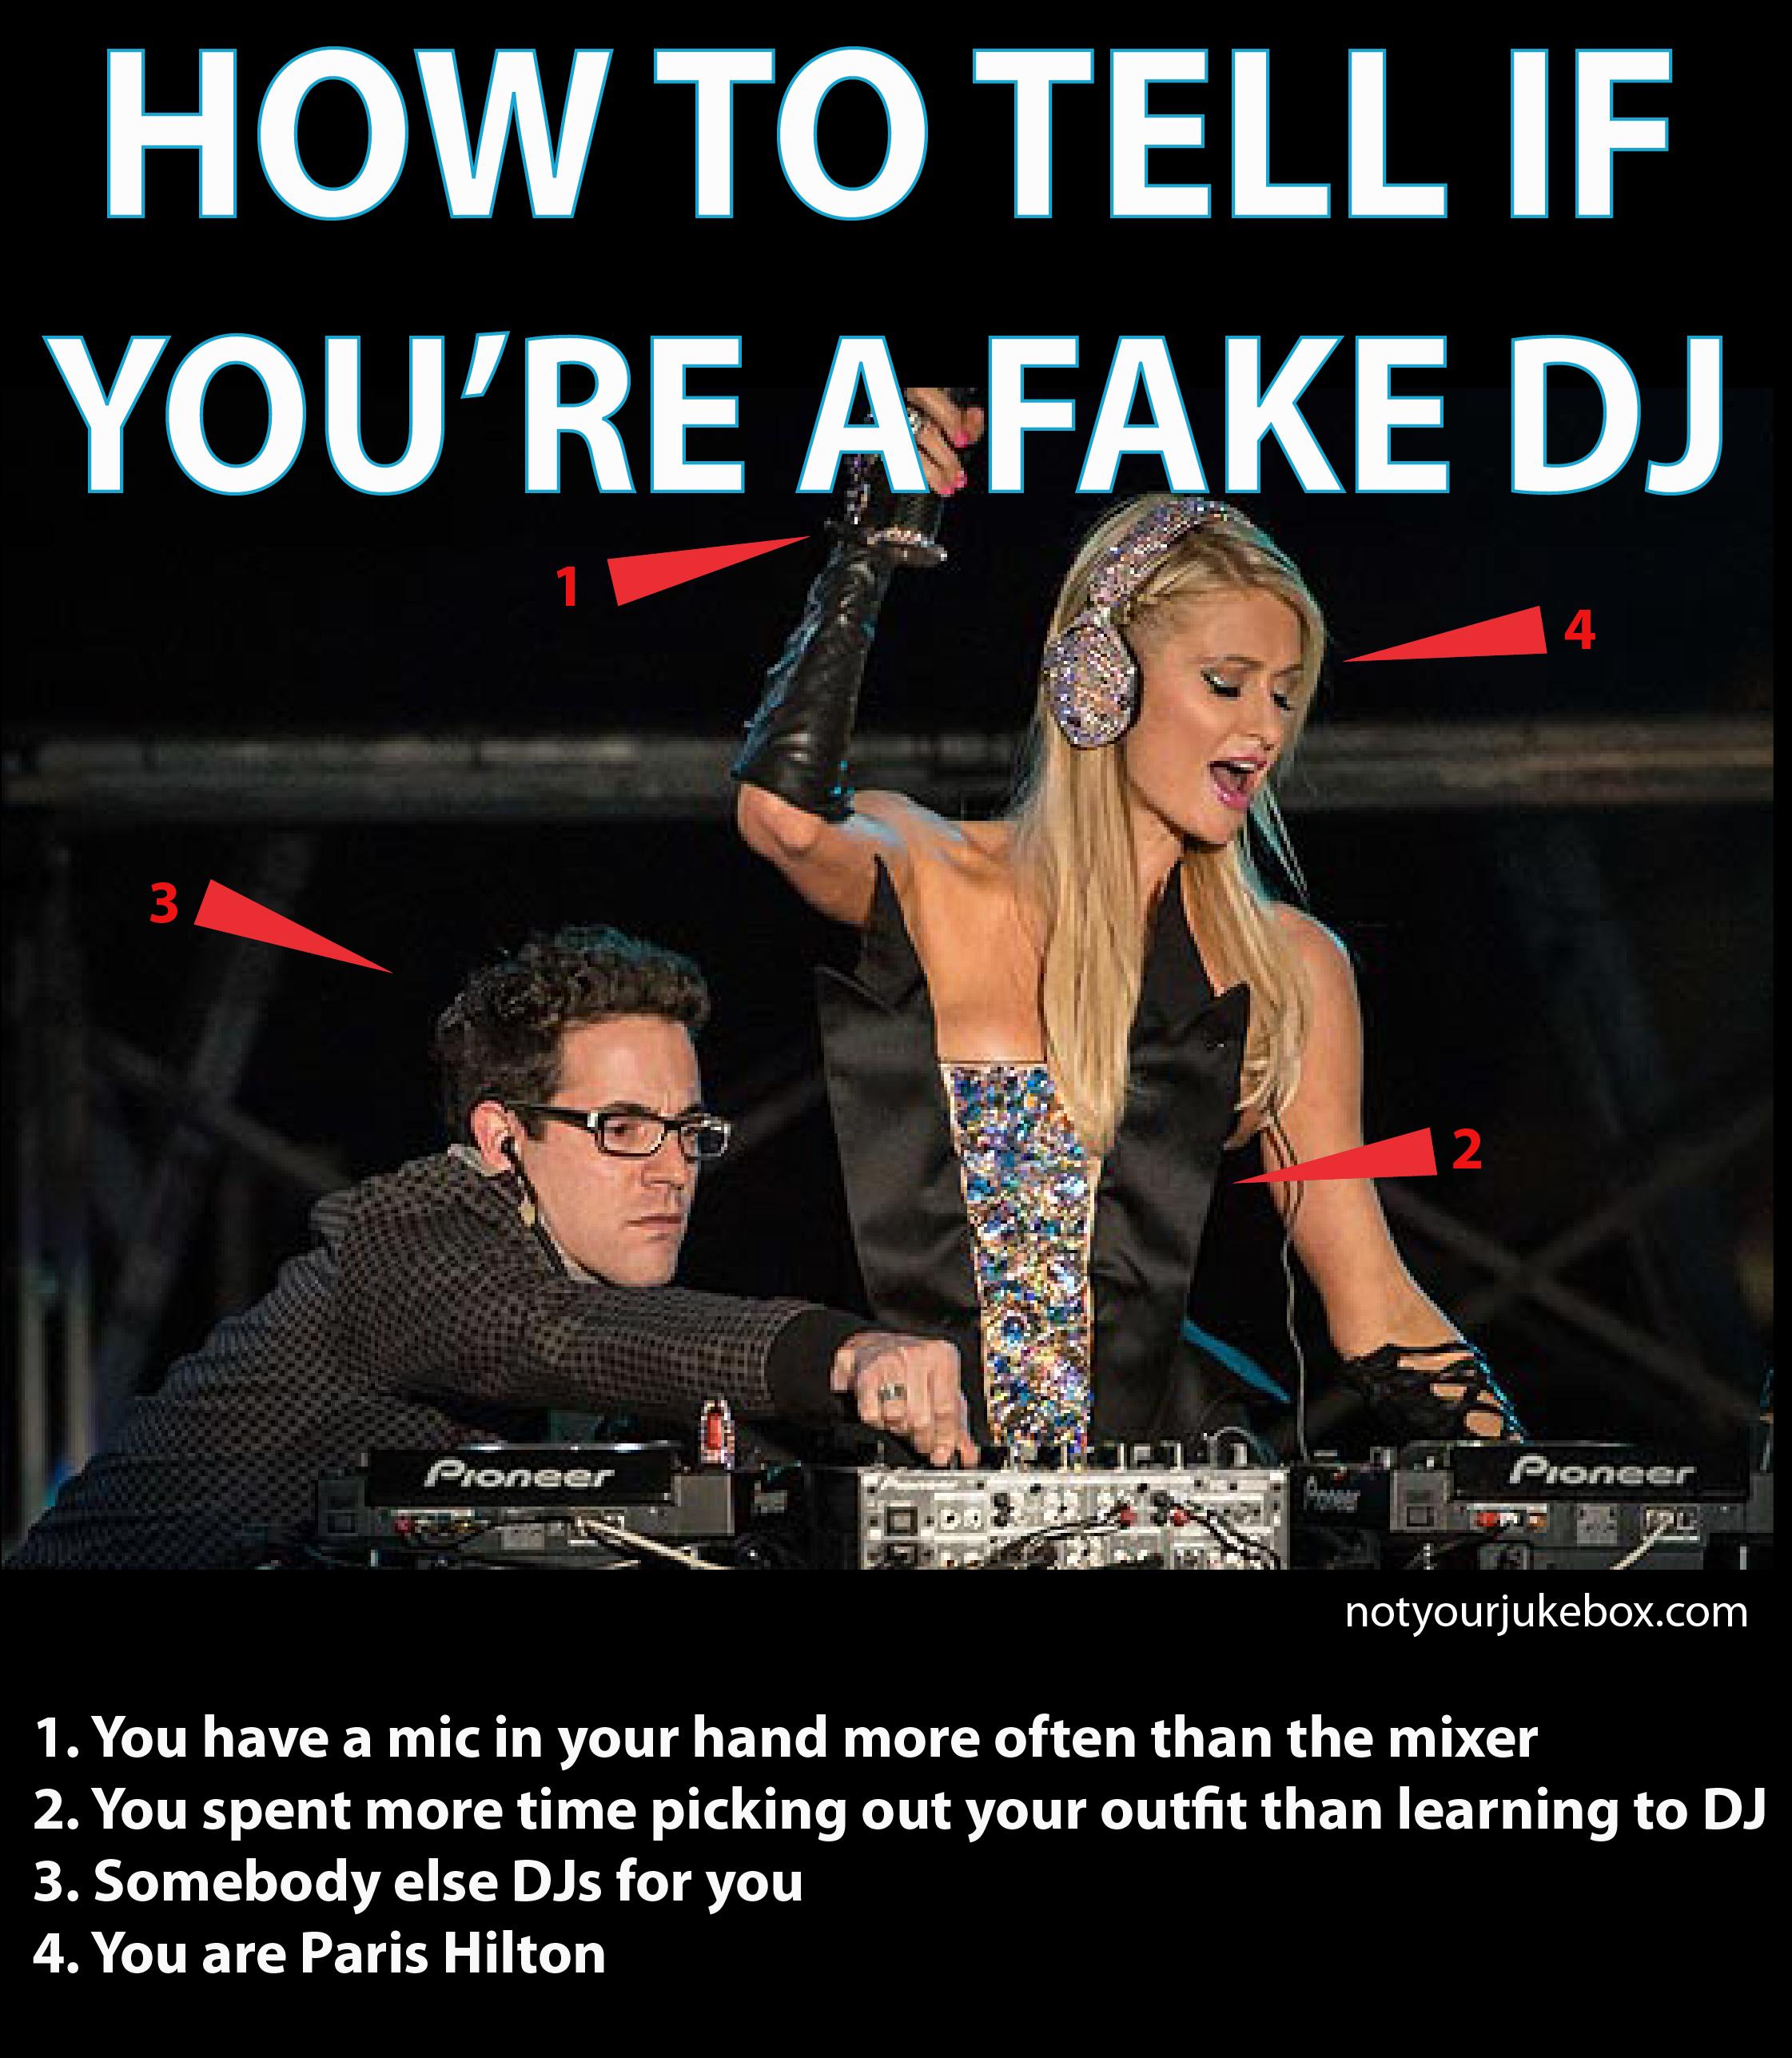 Paris Hilton is not a real DJ